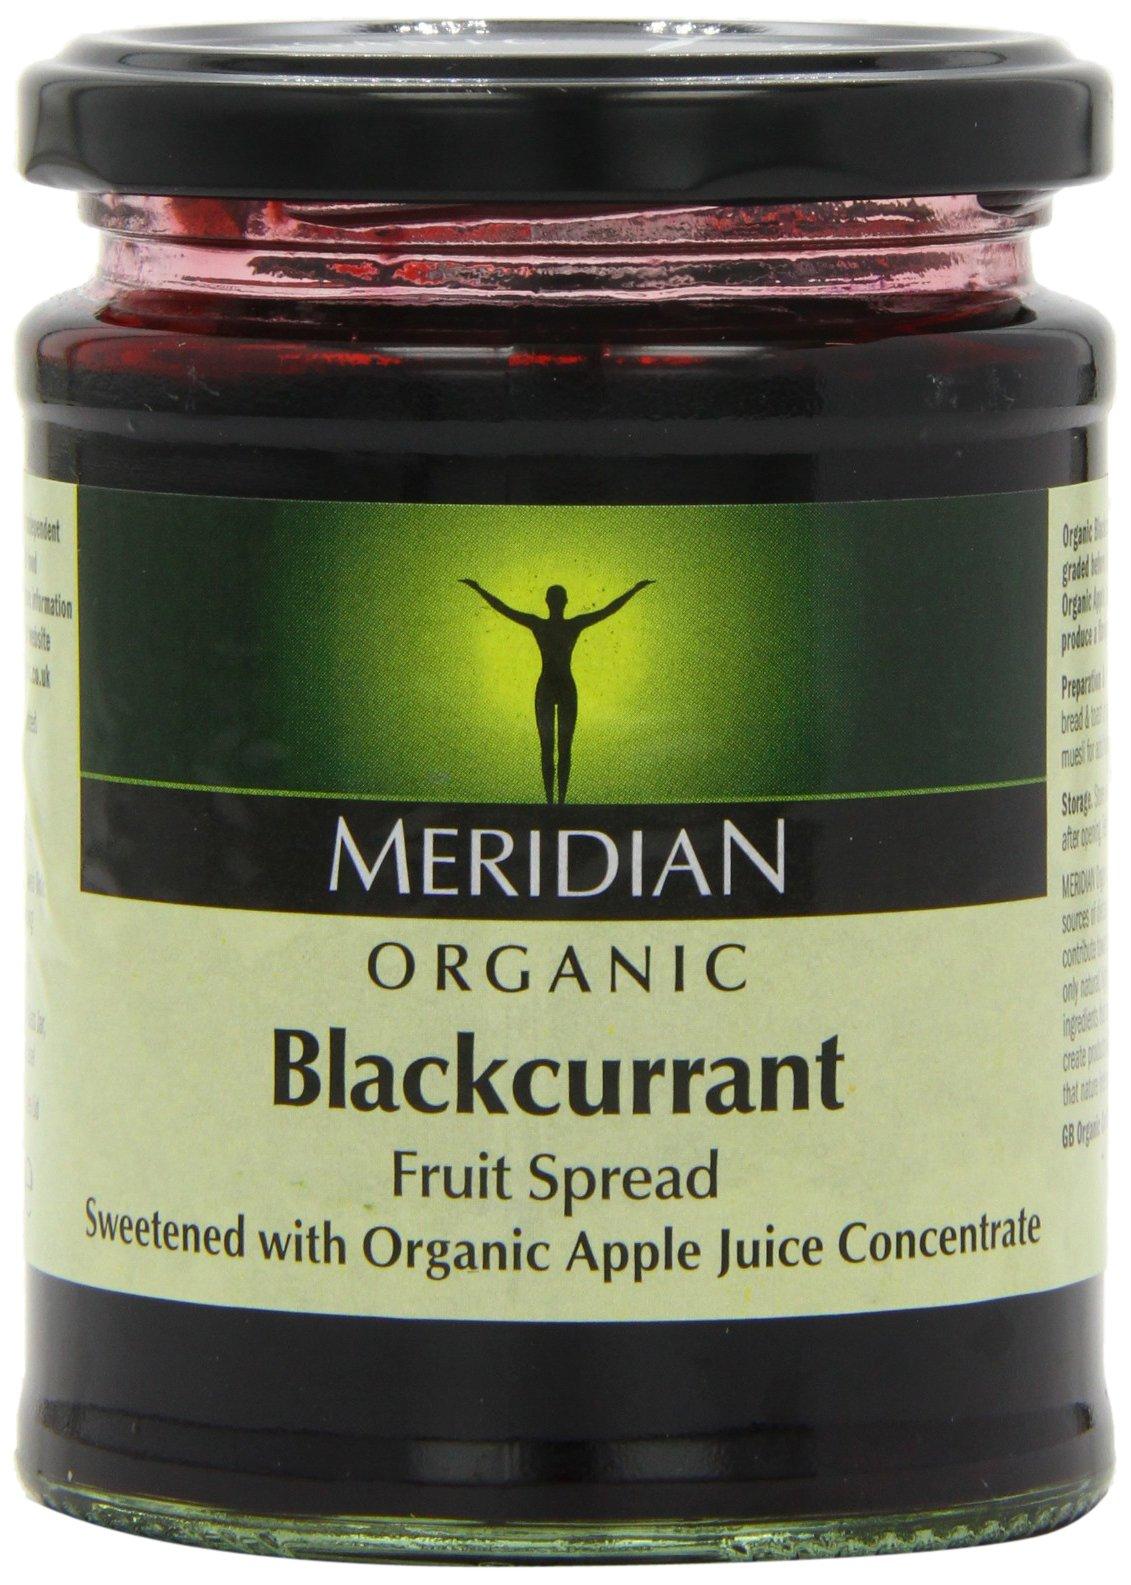 Meridian Organic Blackcurrant Fruit Spread 284 g (Pack of 6) by Meridian (Image #1)